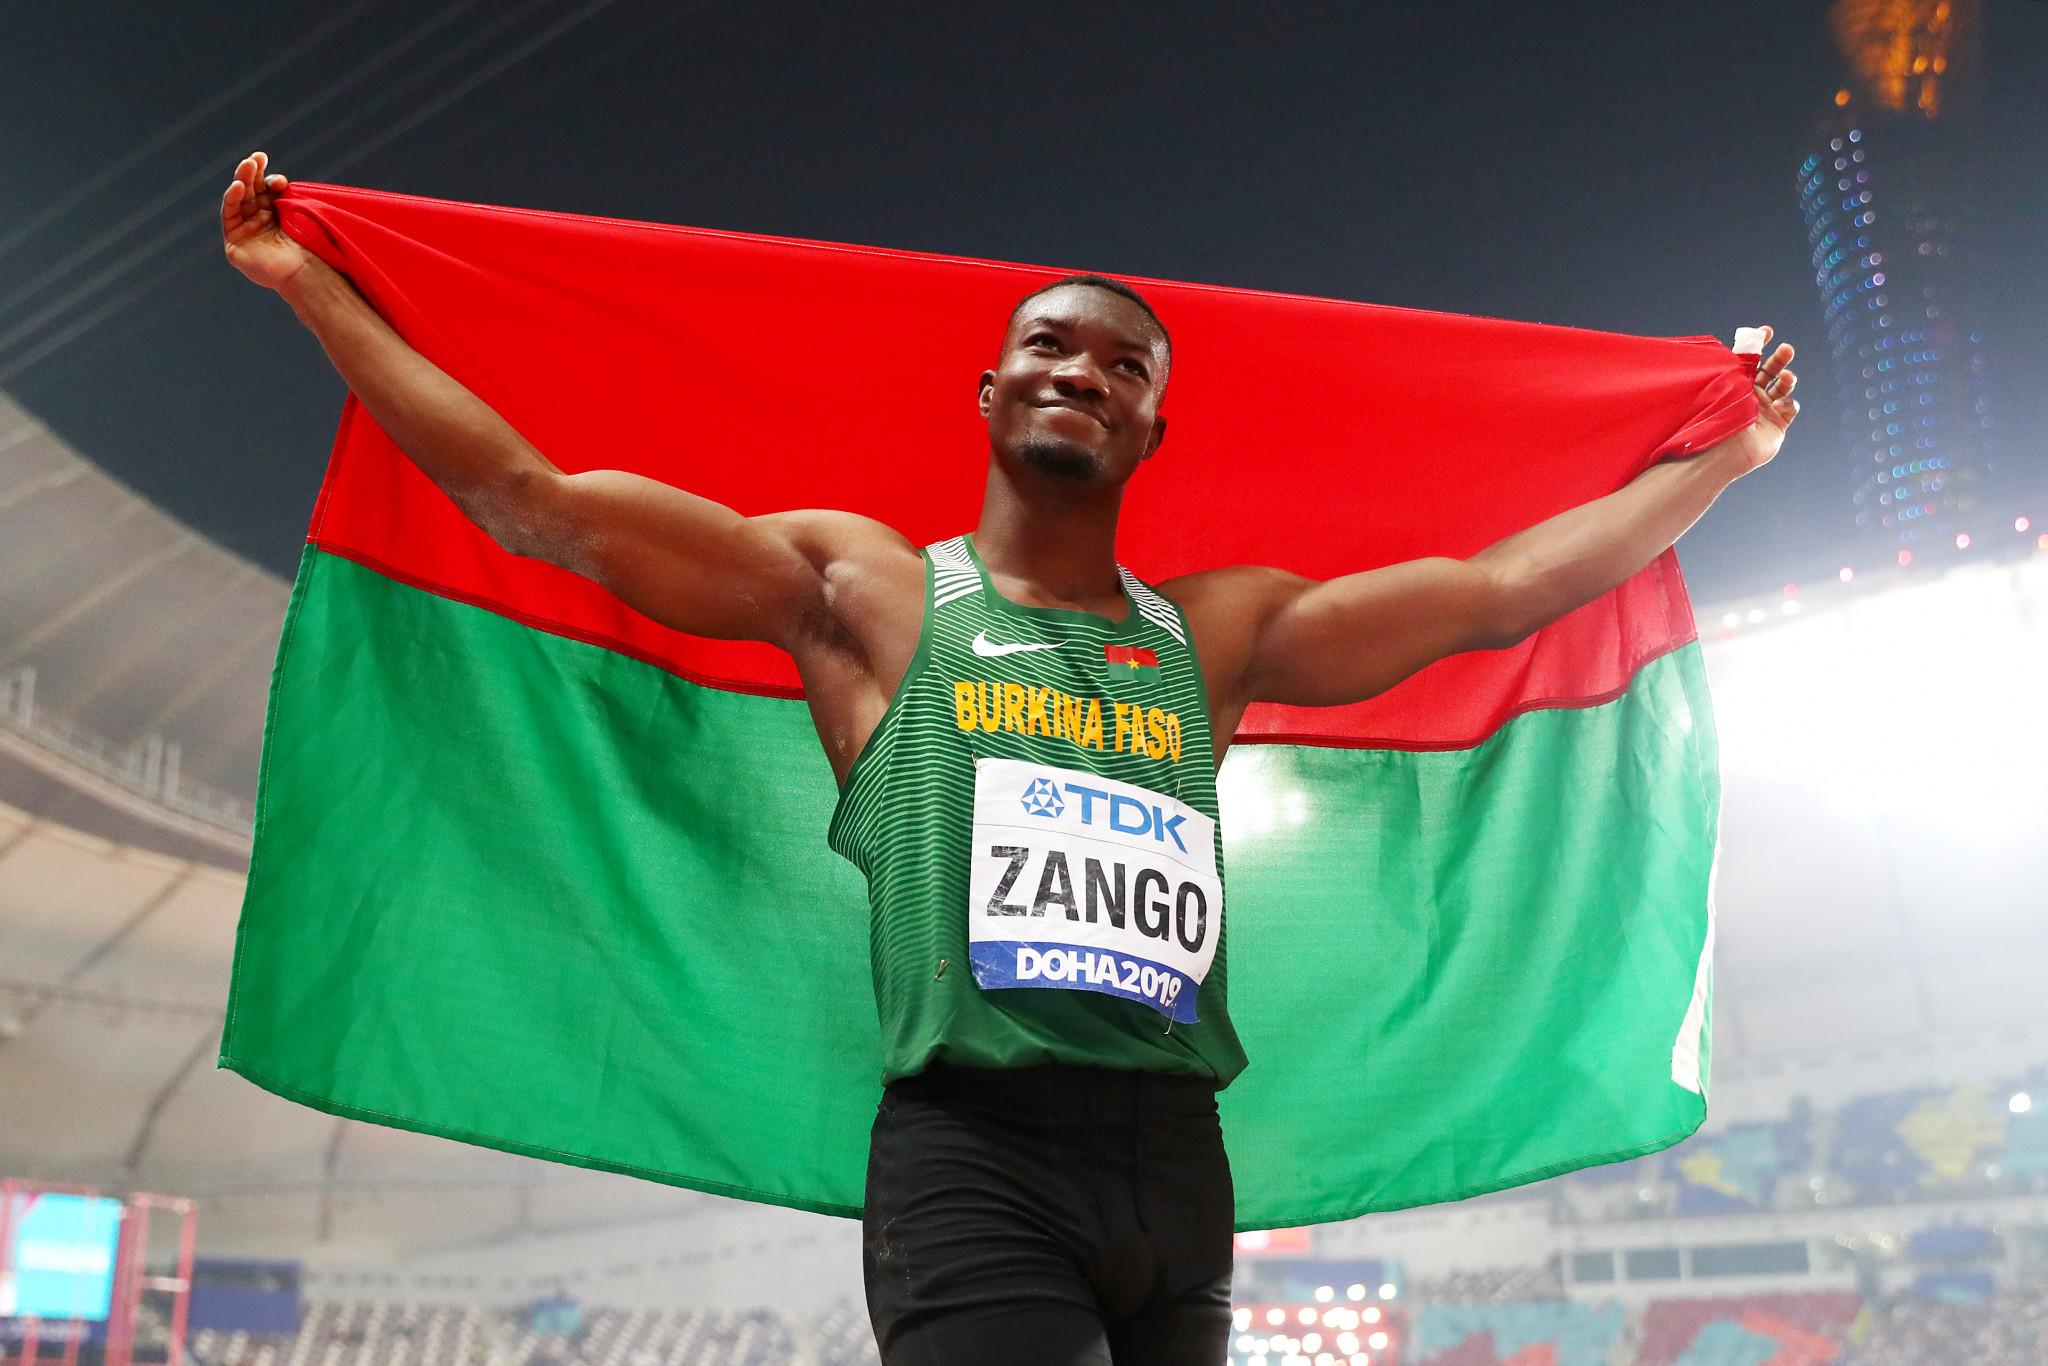 Hugues Fabrice Zango of Burkina Faso is now targeting Tokyo 2020 ©Getty Images